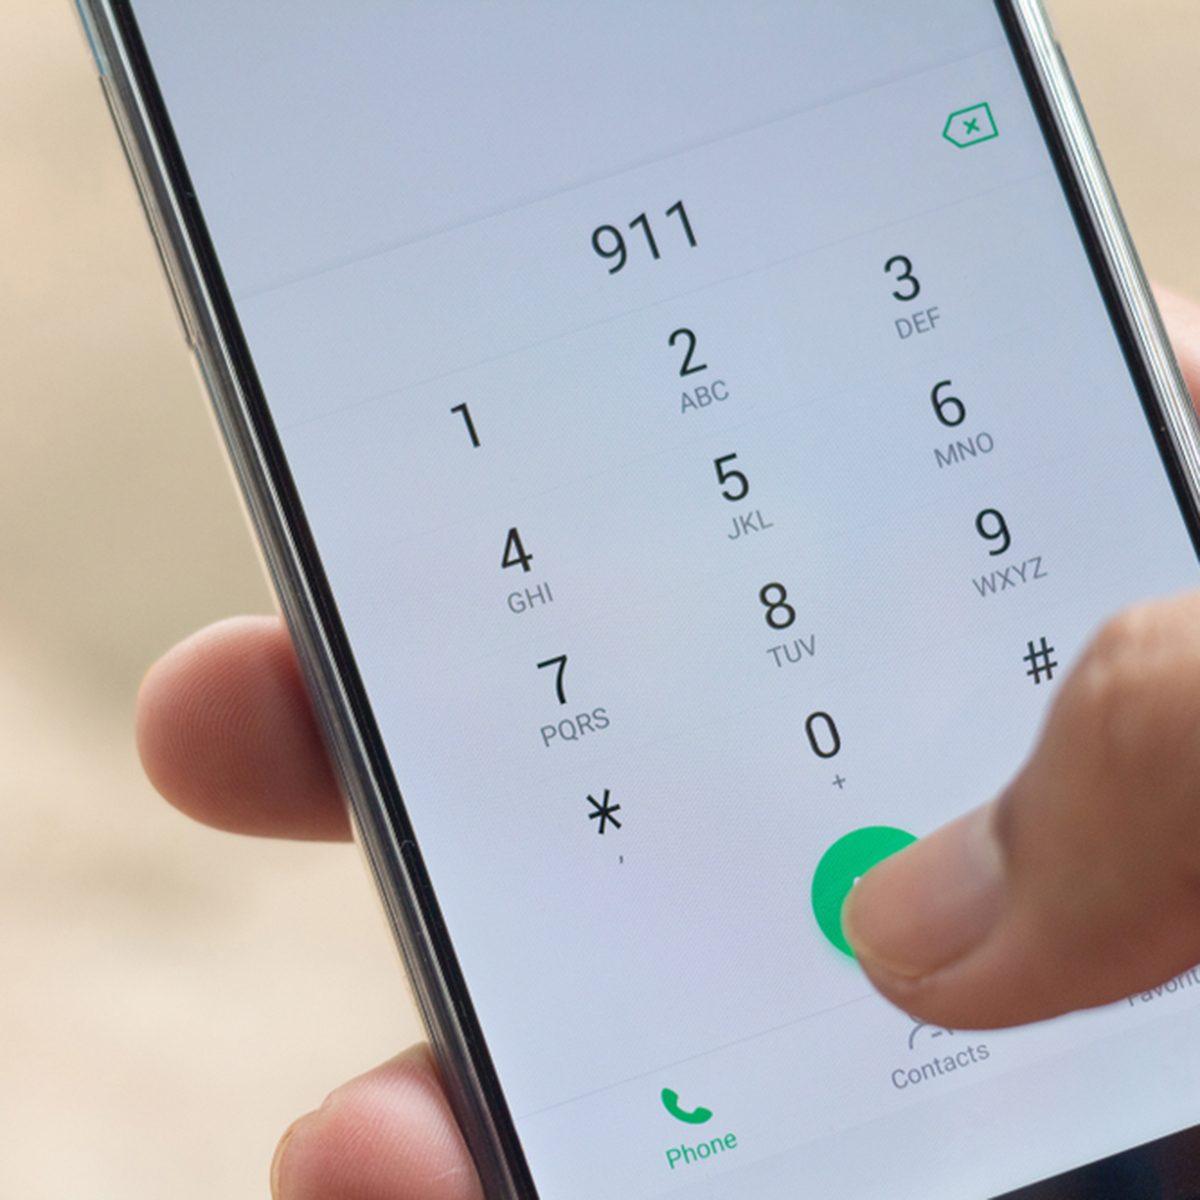 Emergency and urgency, dialing 911 on smartphone screen.; Shutterstock ID 1167521353; Job (TFH, TOH, RD, BNB, CWM, CM): TOH